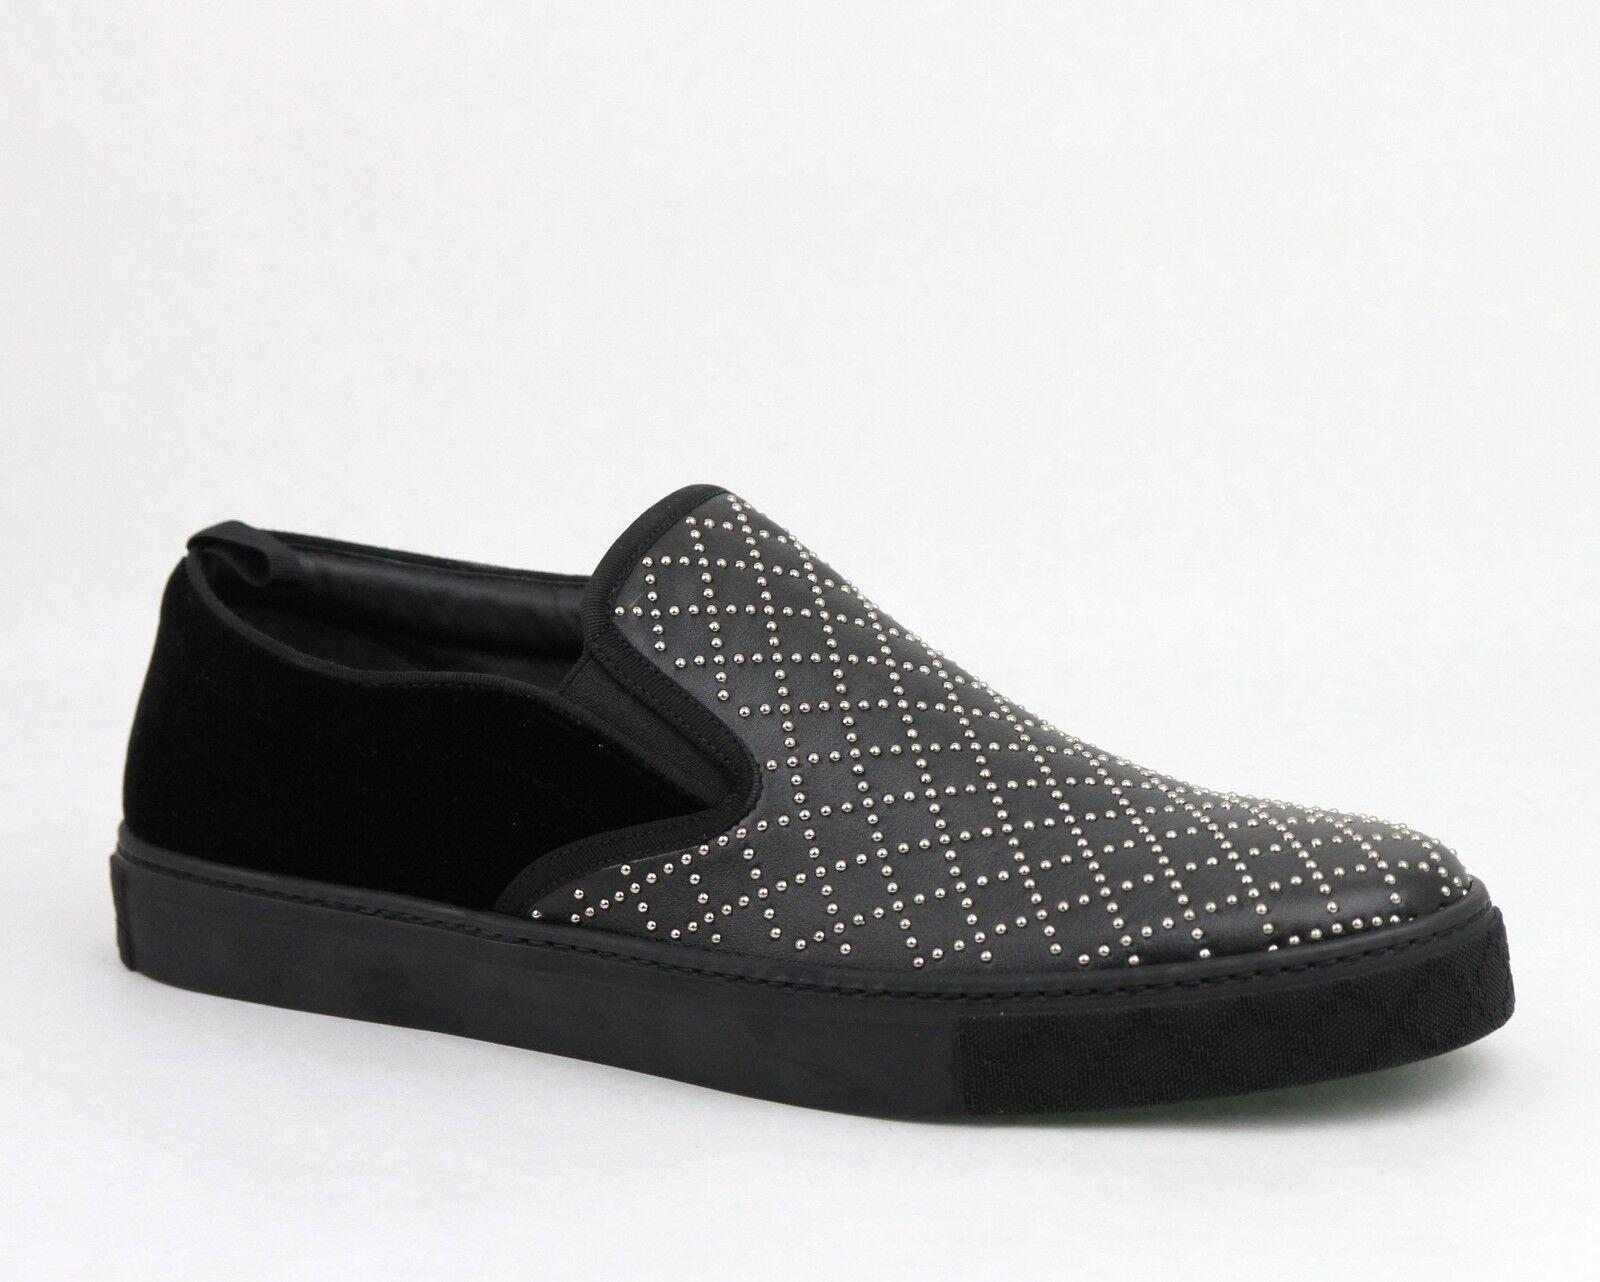 $595 Gucci Men's Studded Leather Suede Slip-on Shoe Sneaker Black 322758 1000